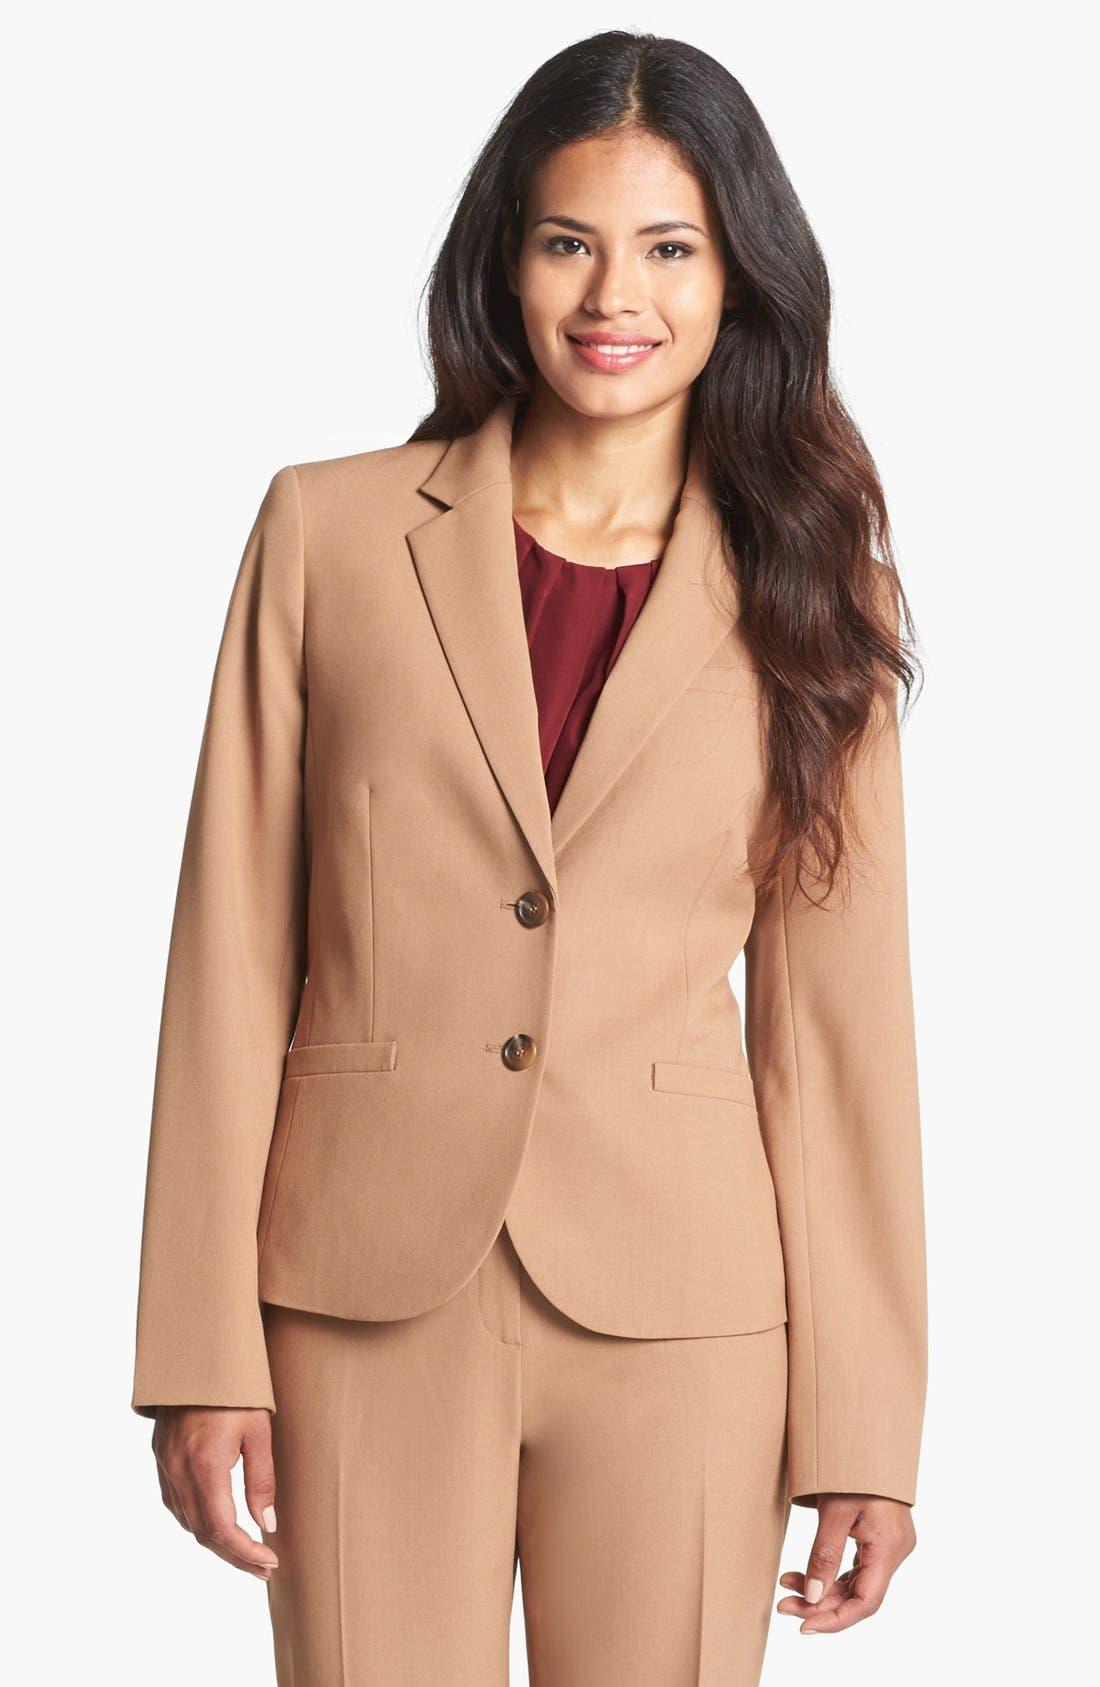 Alternate Image 1 Selected - Jones New York 'Olivia - Seasonless Stretch' Jacket (Regular & Petite)